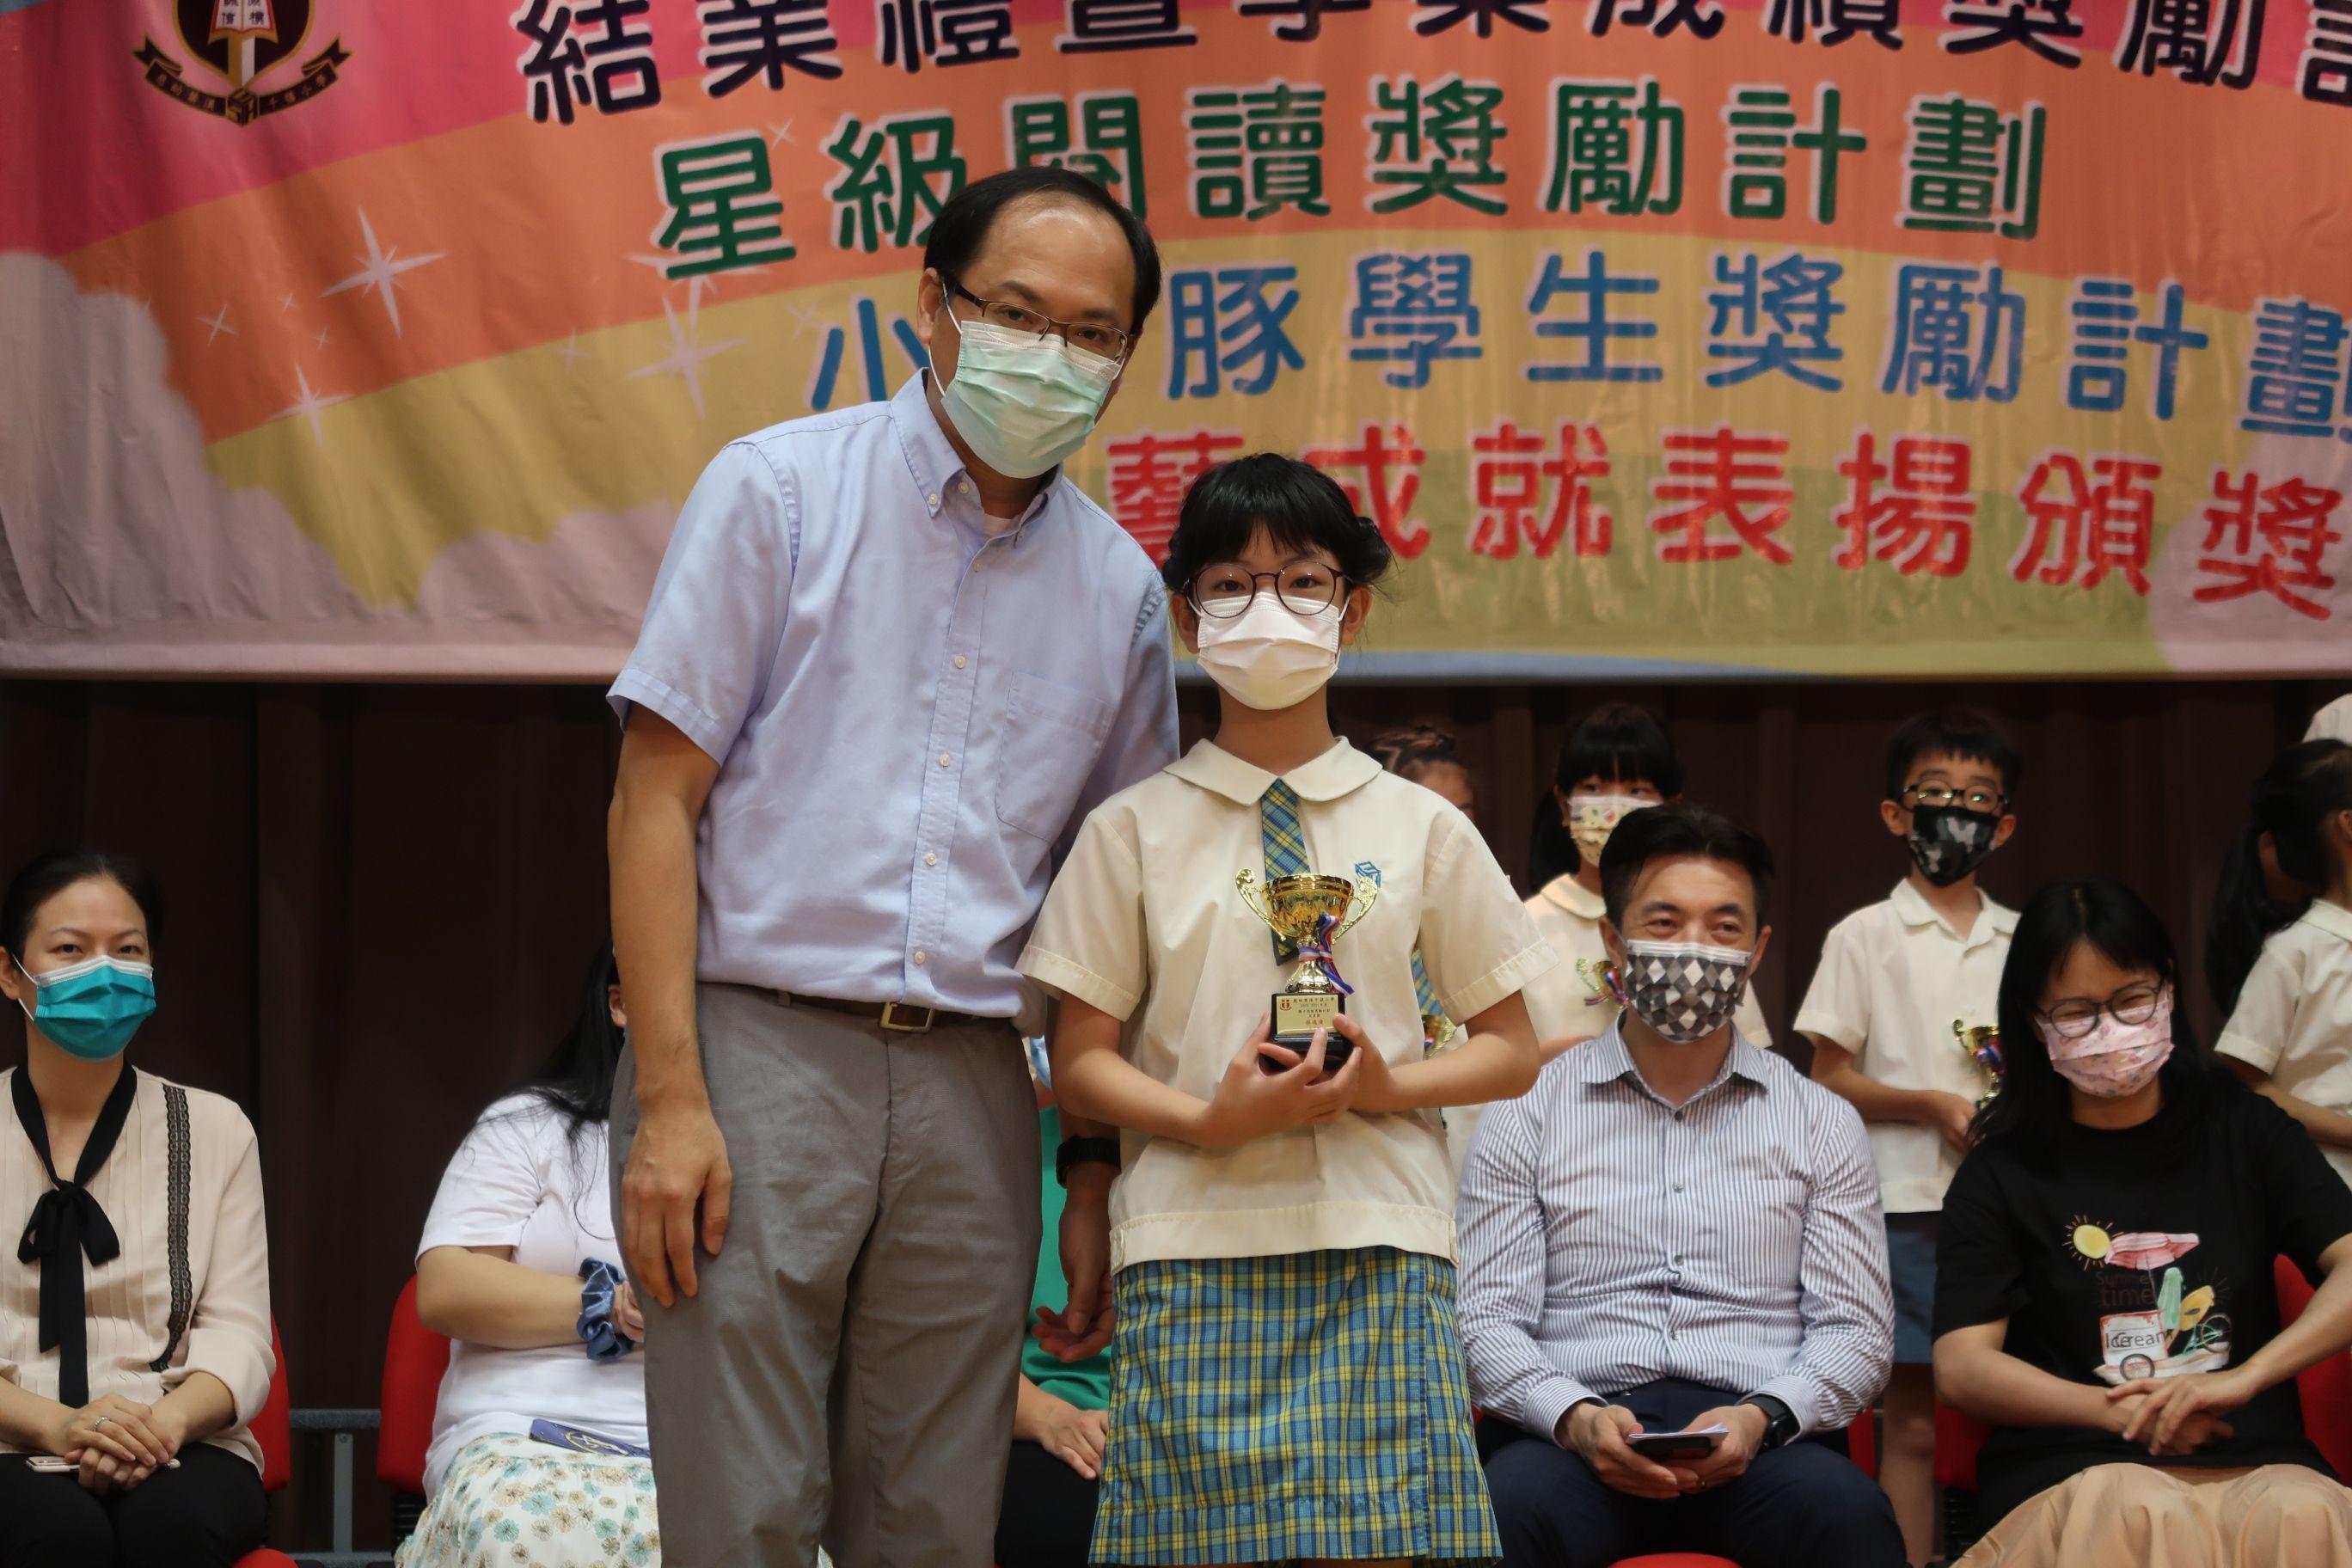 https://syh.edu.hk/sites/default/files/img_5851.jpg